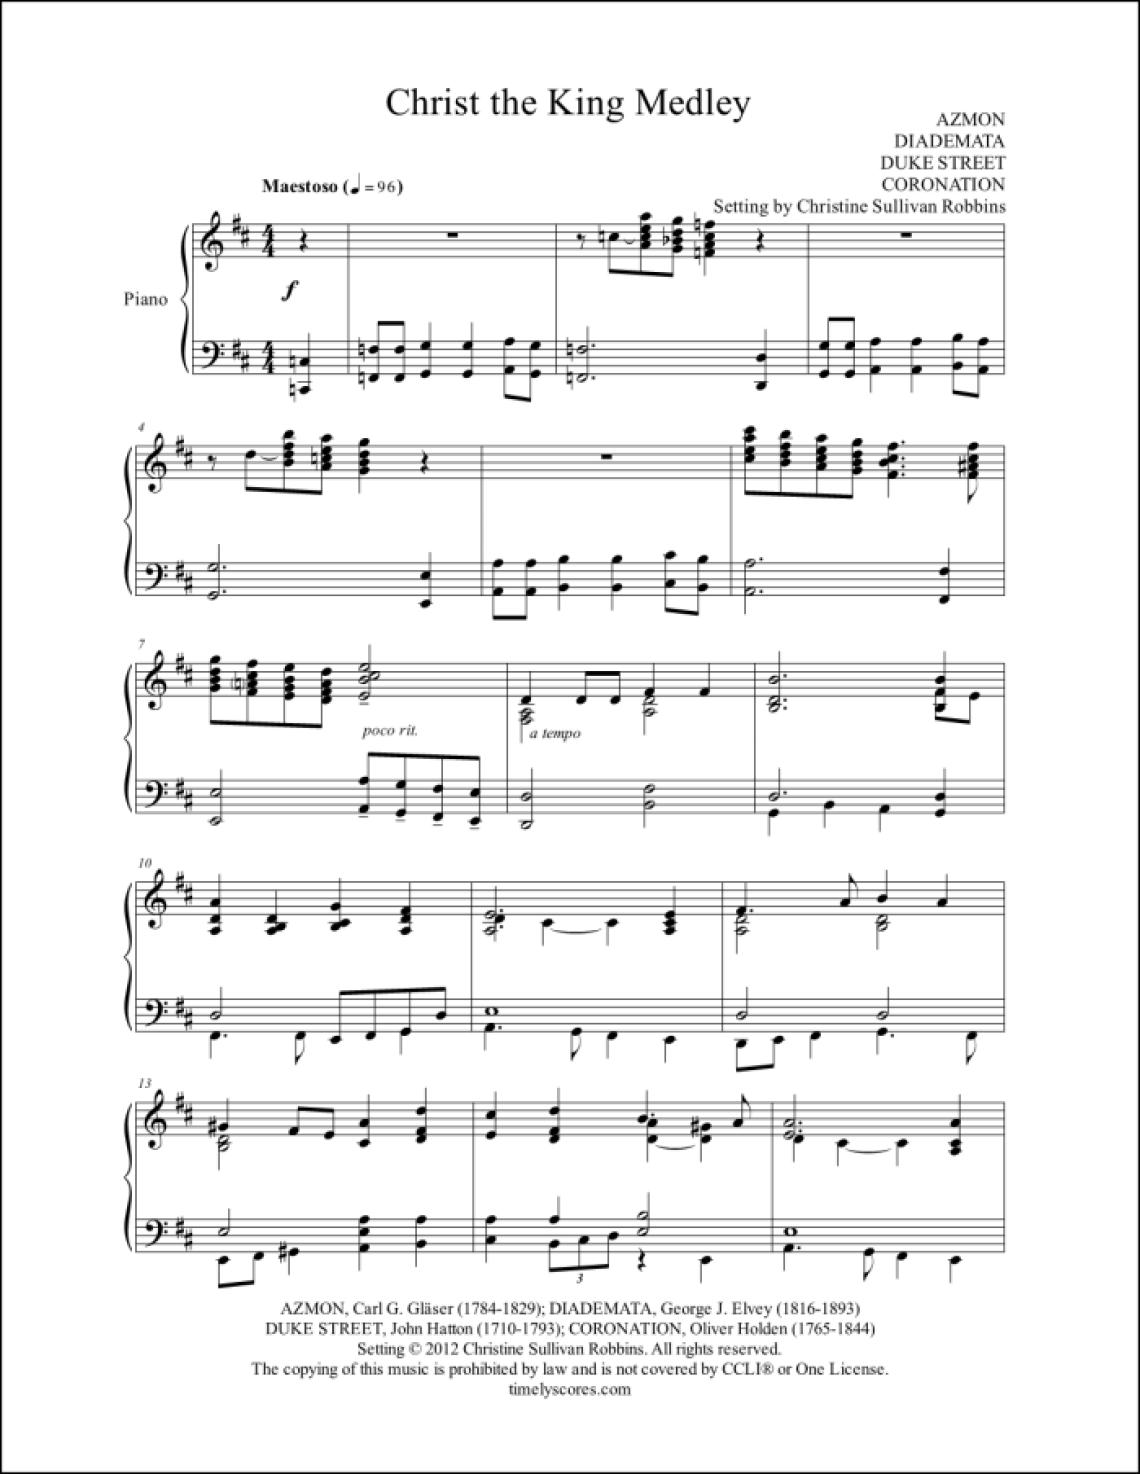 Christ the King Medley Piano Sheet Music